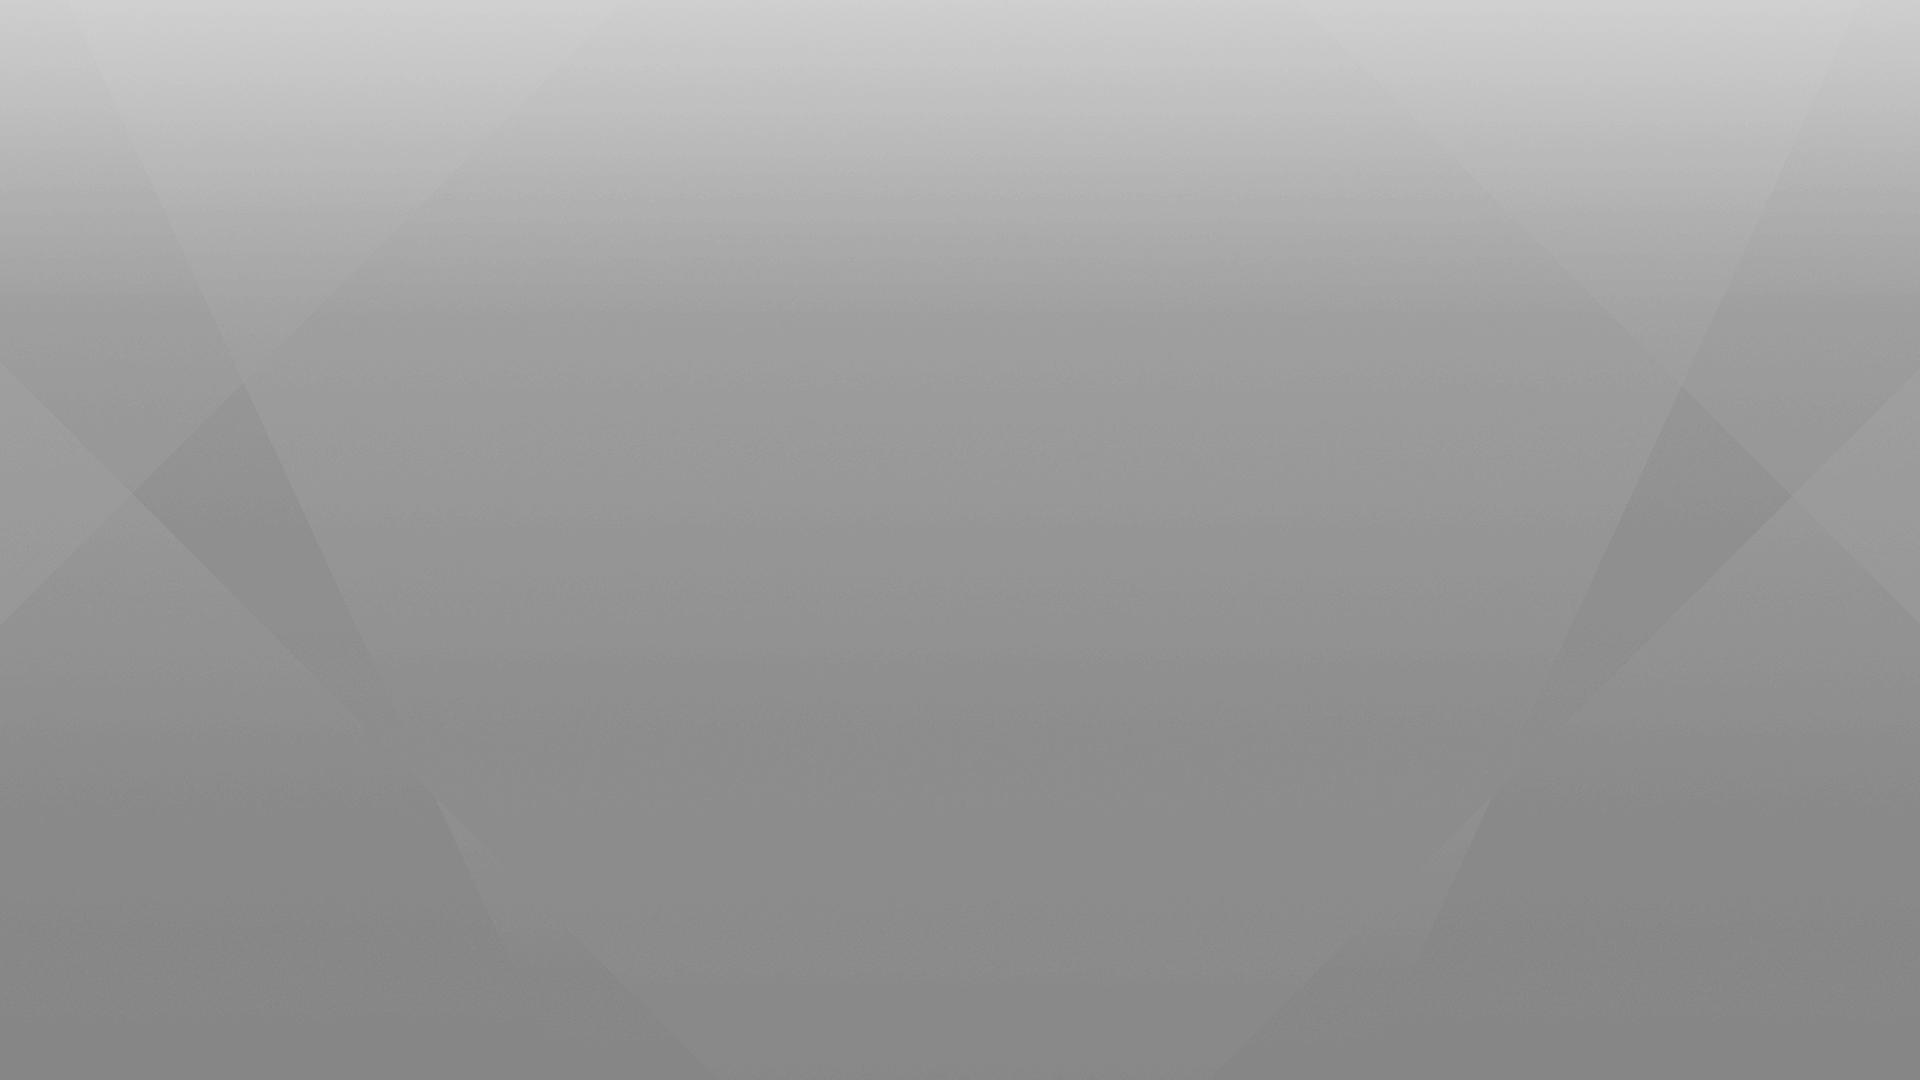 Ubuntu 20.04 Grey Plain Wallpaper